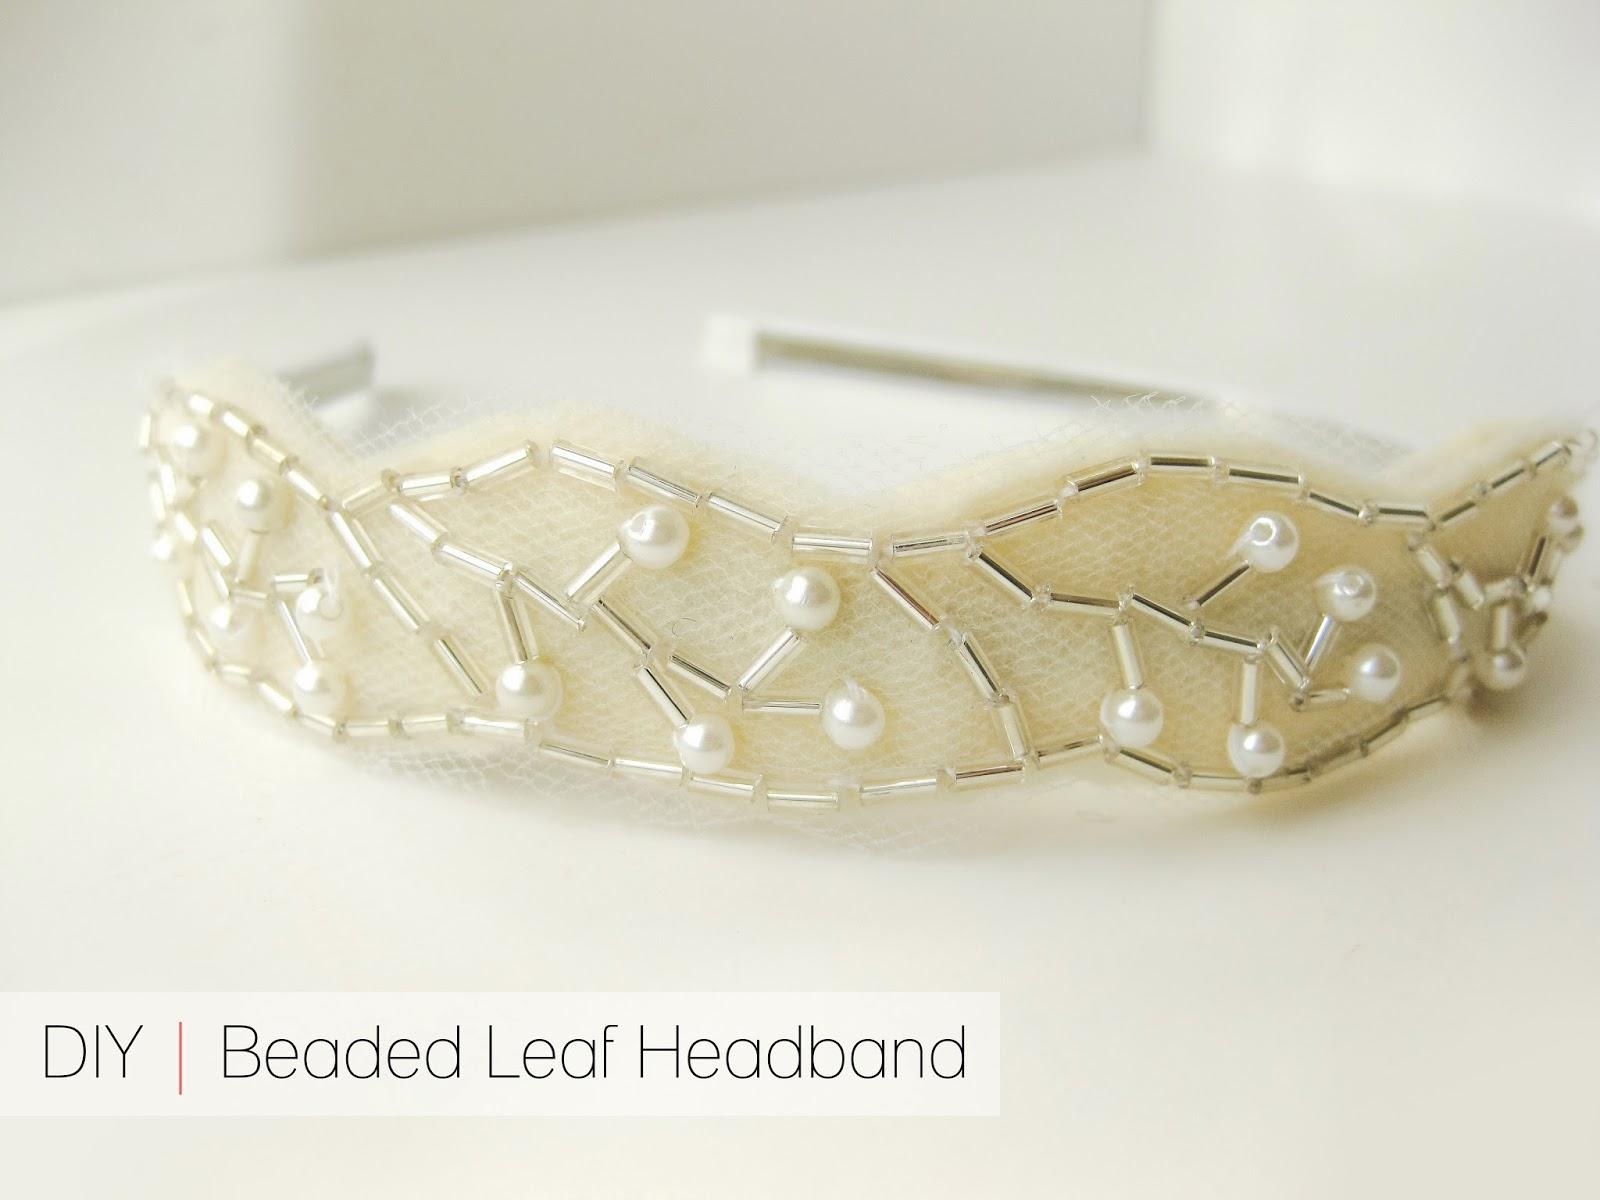 cafe craftea: diy | beaded leaf headband